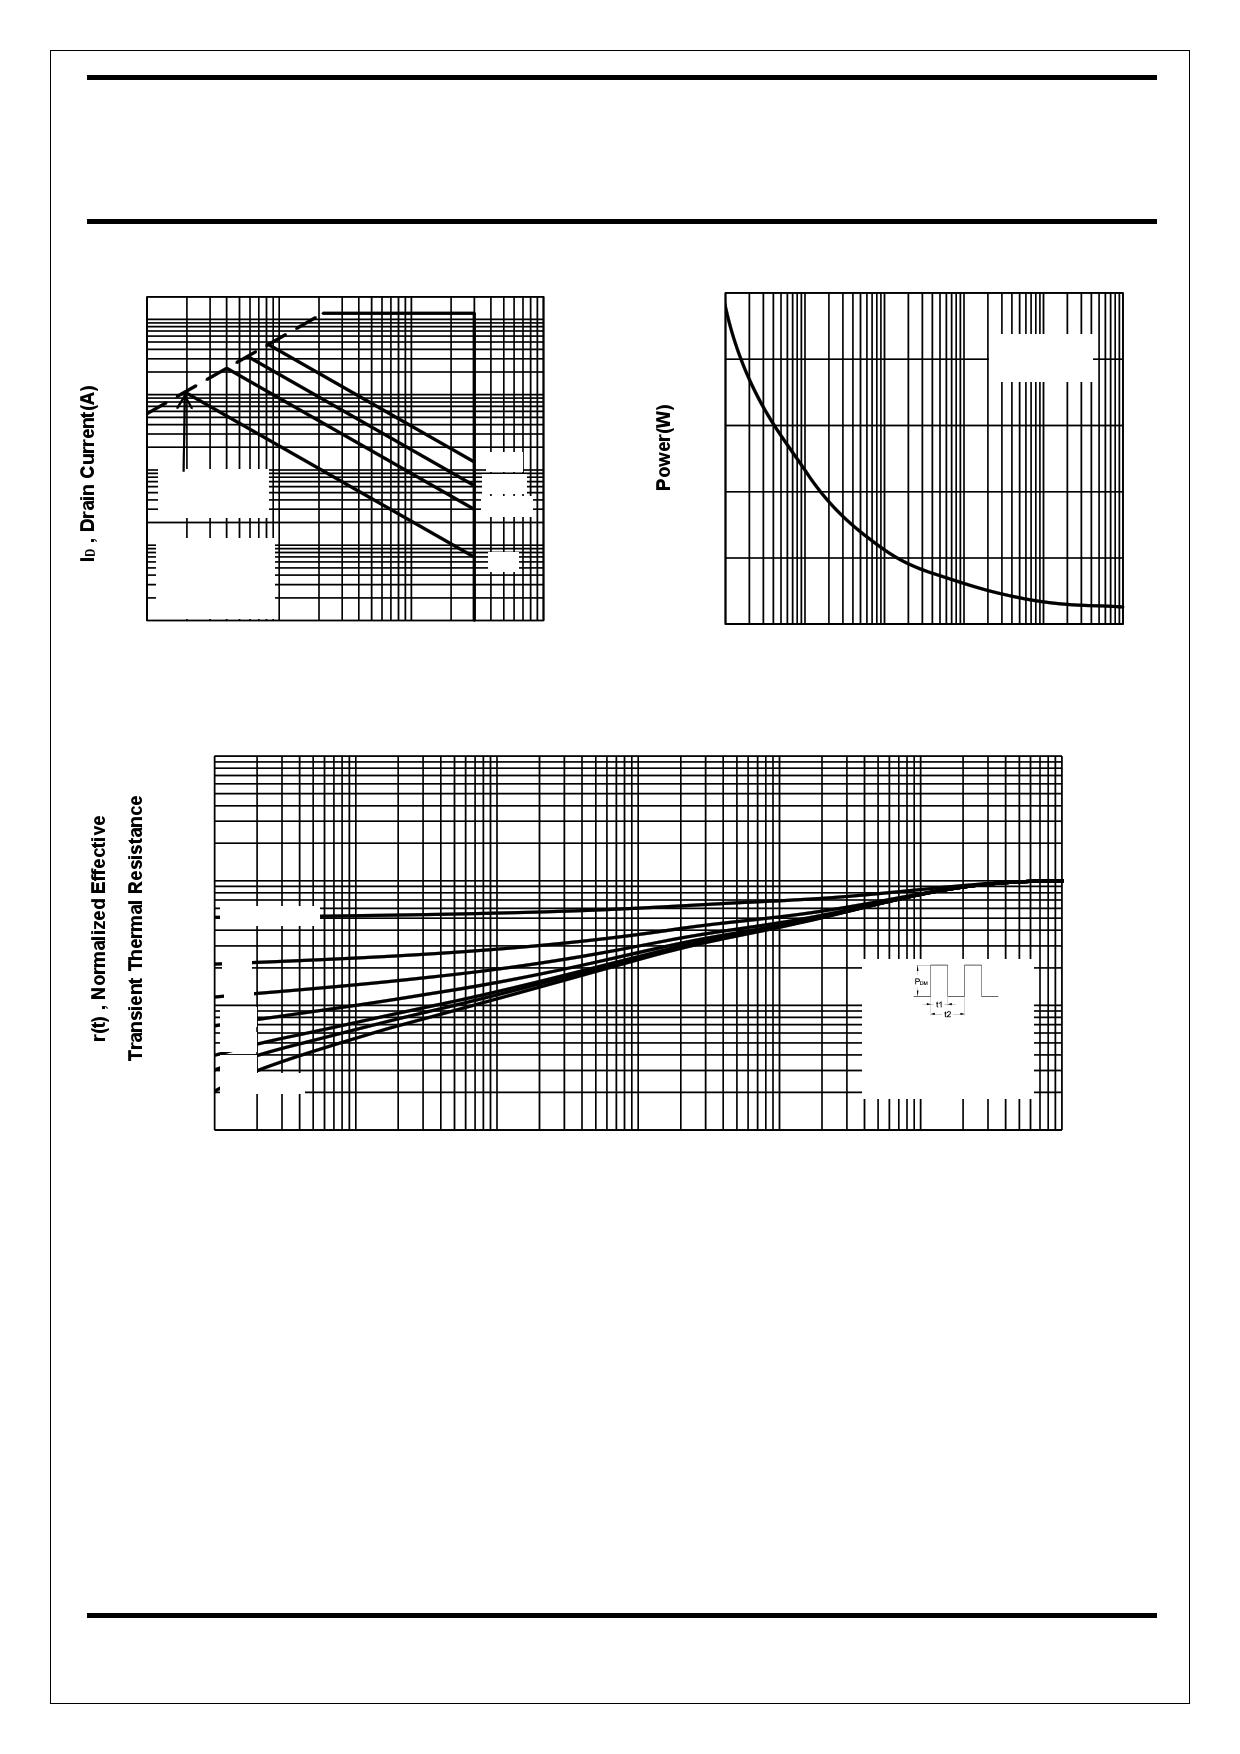 PK502BA pdf, 반도체, 판매, 대치품